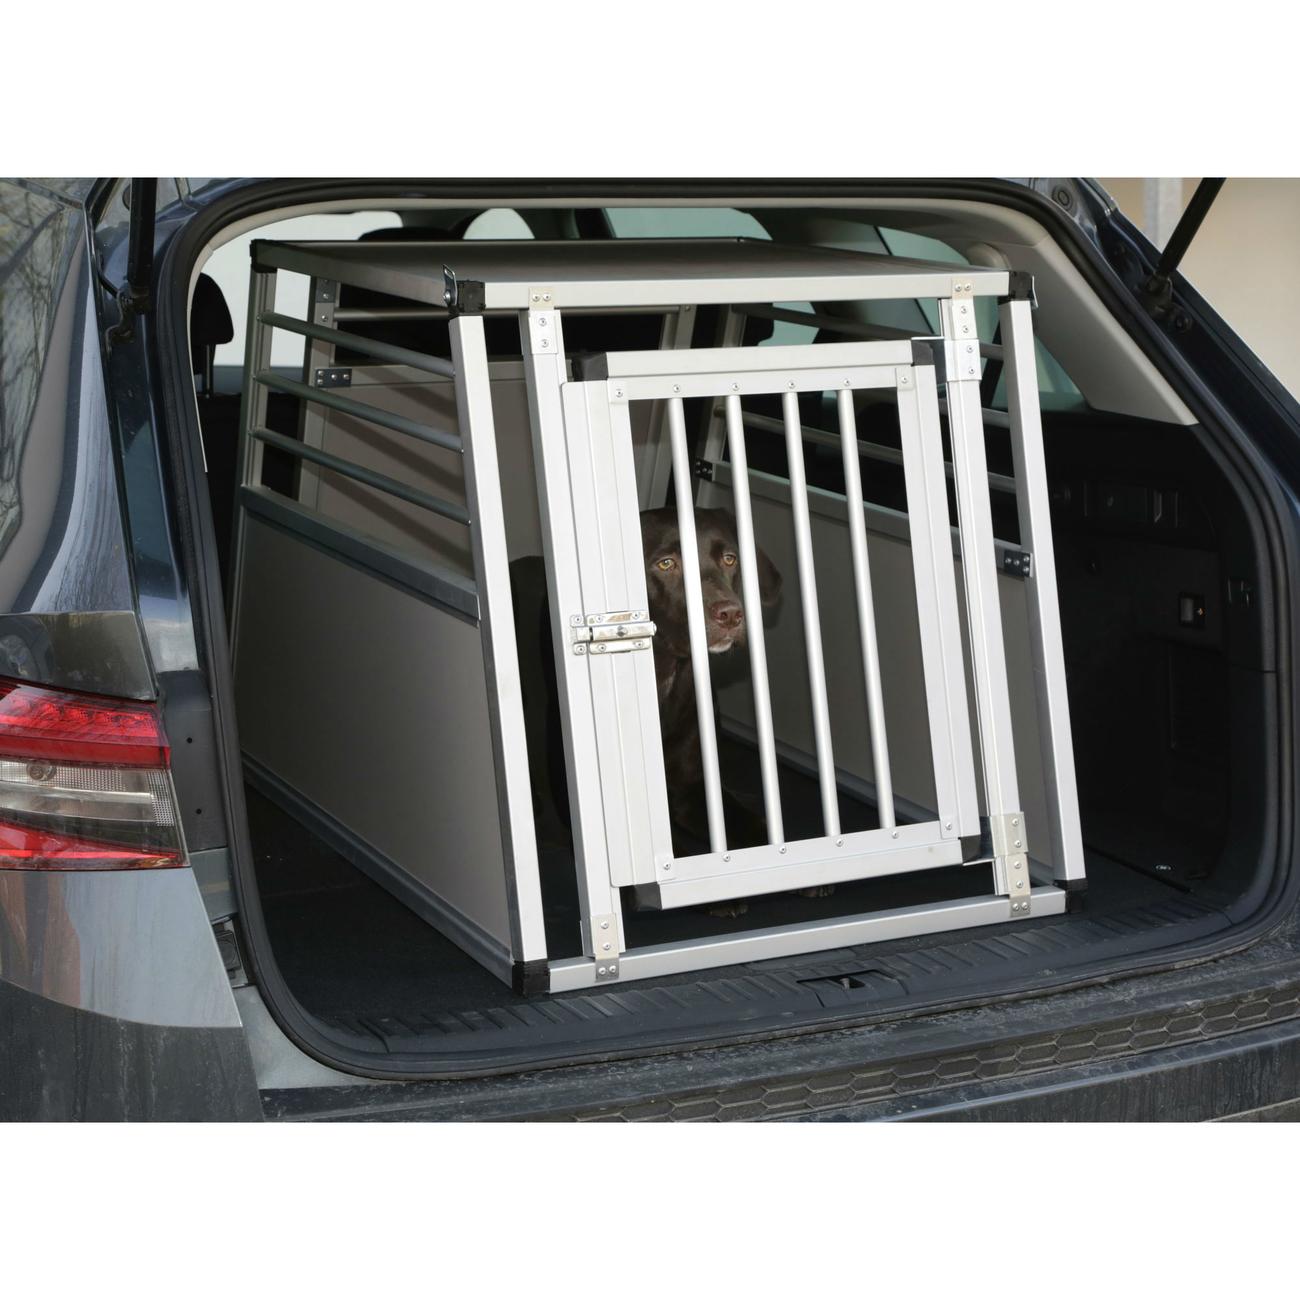 Kerbl Alu-Hunde Transportbox Barry eintürig, Bild 6